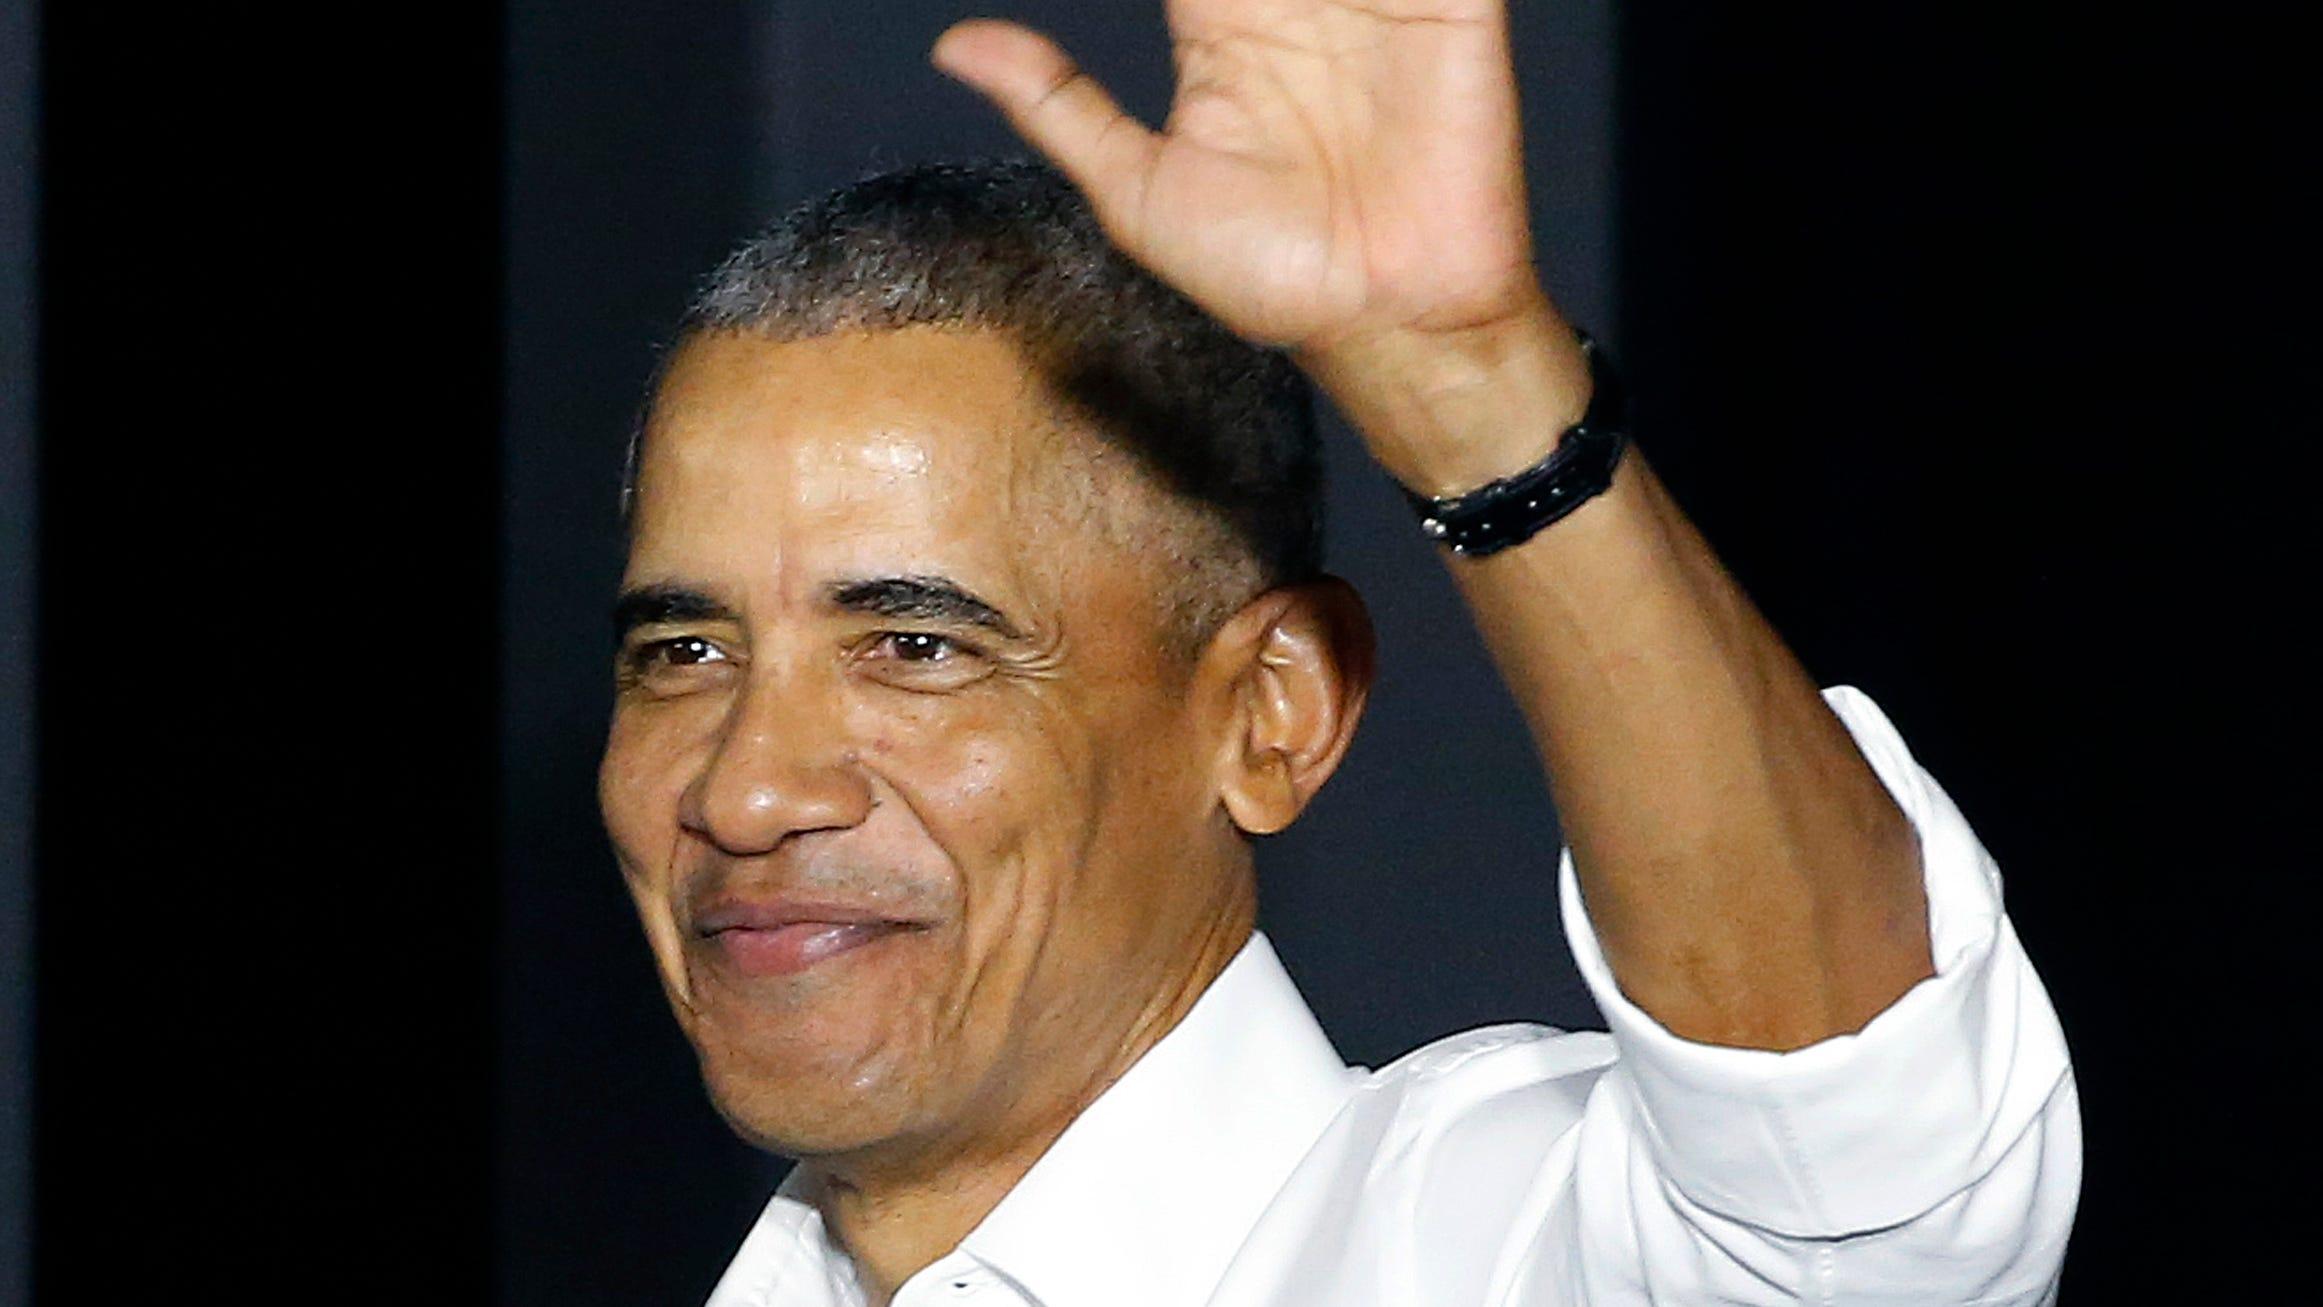 Barack Obama's 60th birthday bash: Everything we know, including COVID protocols